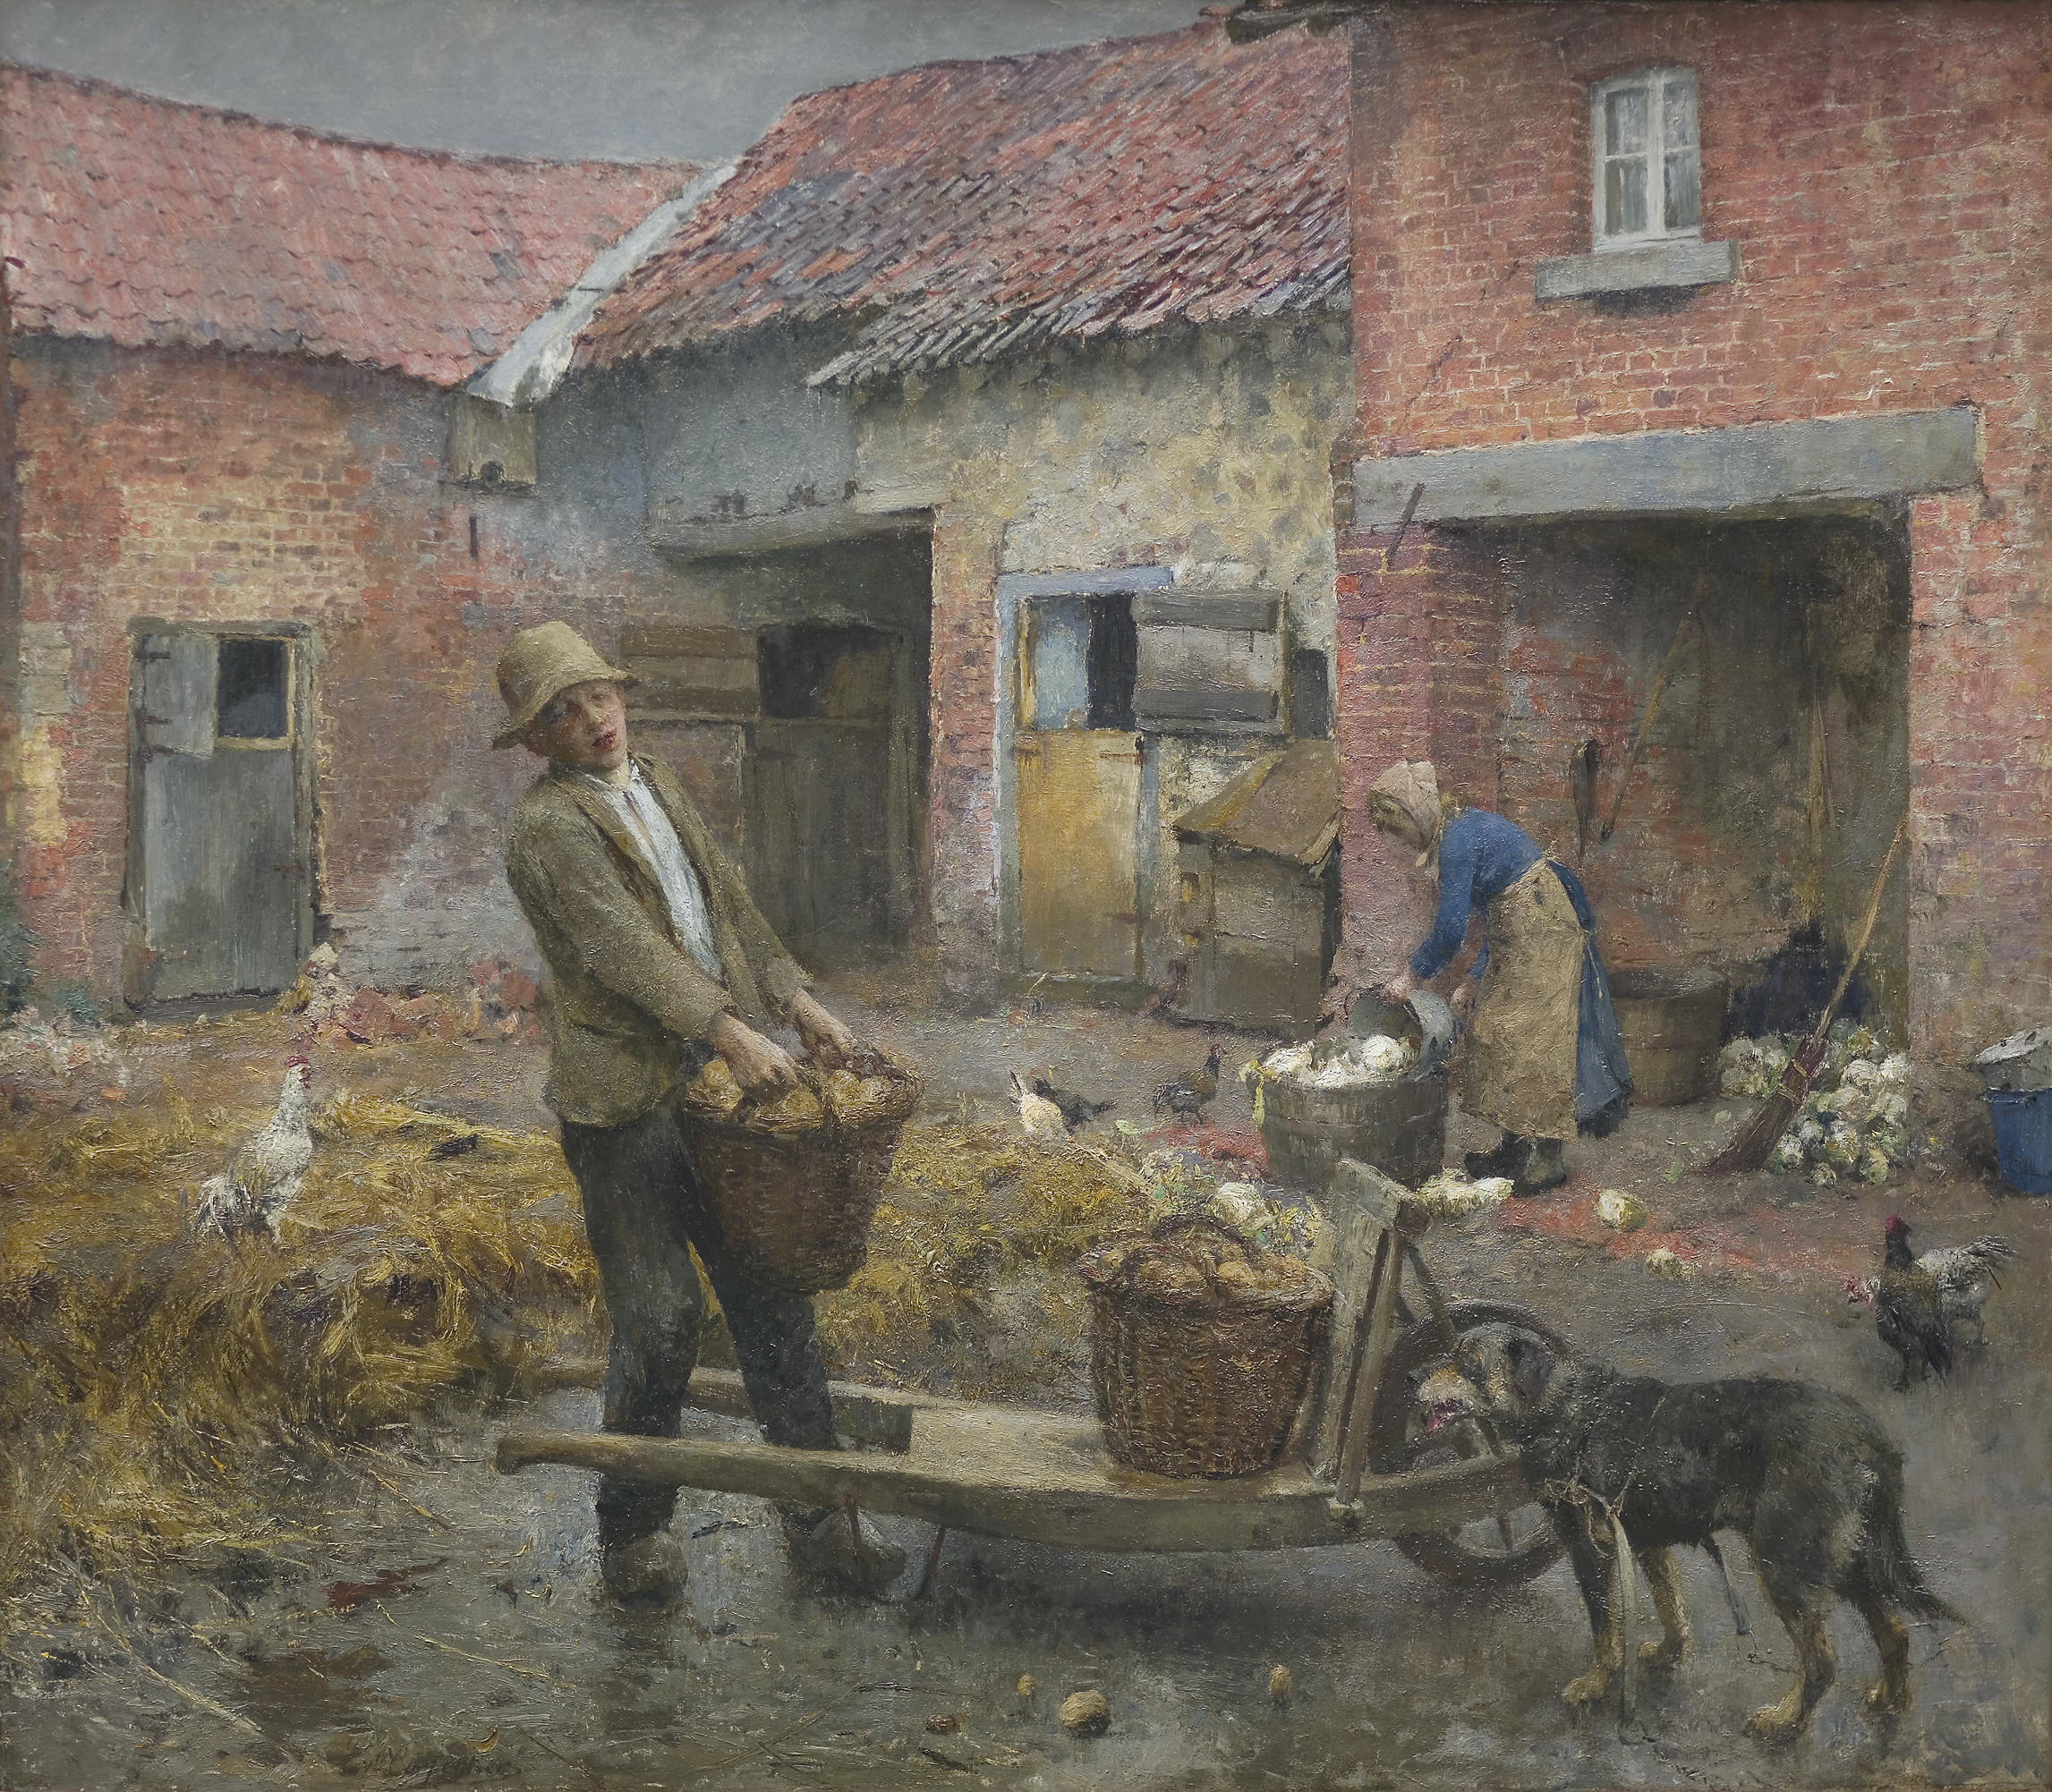 View of a Riverside Town, Johan Hendrik Van Mastenbroek, 1899, oil on canvas.